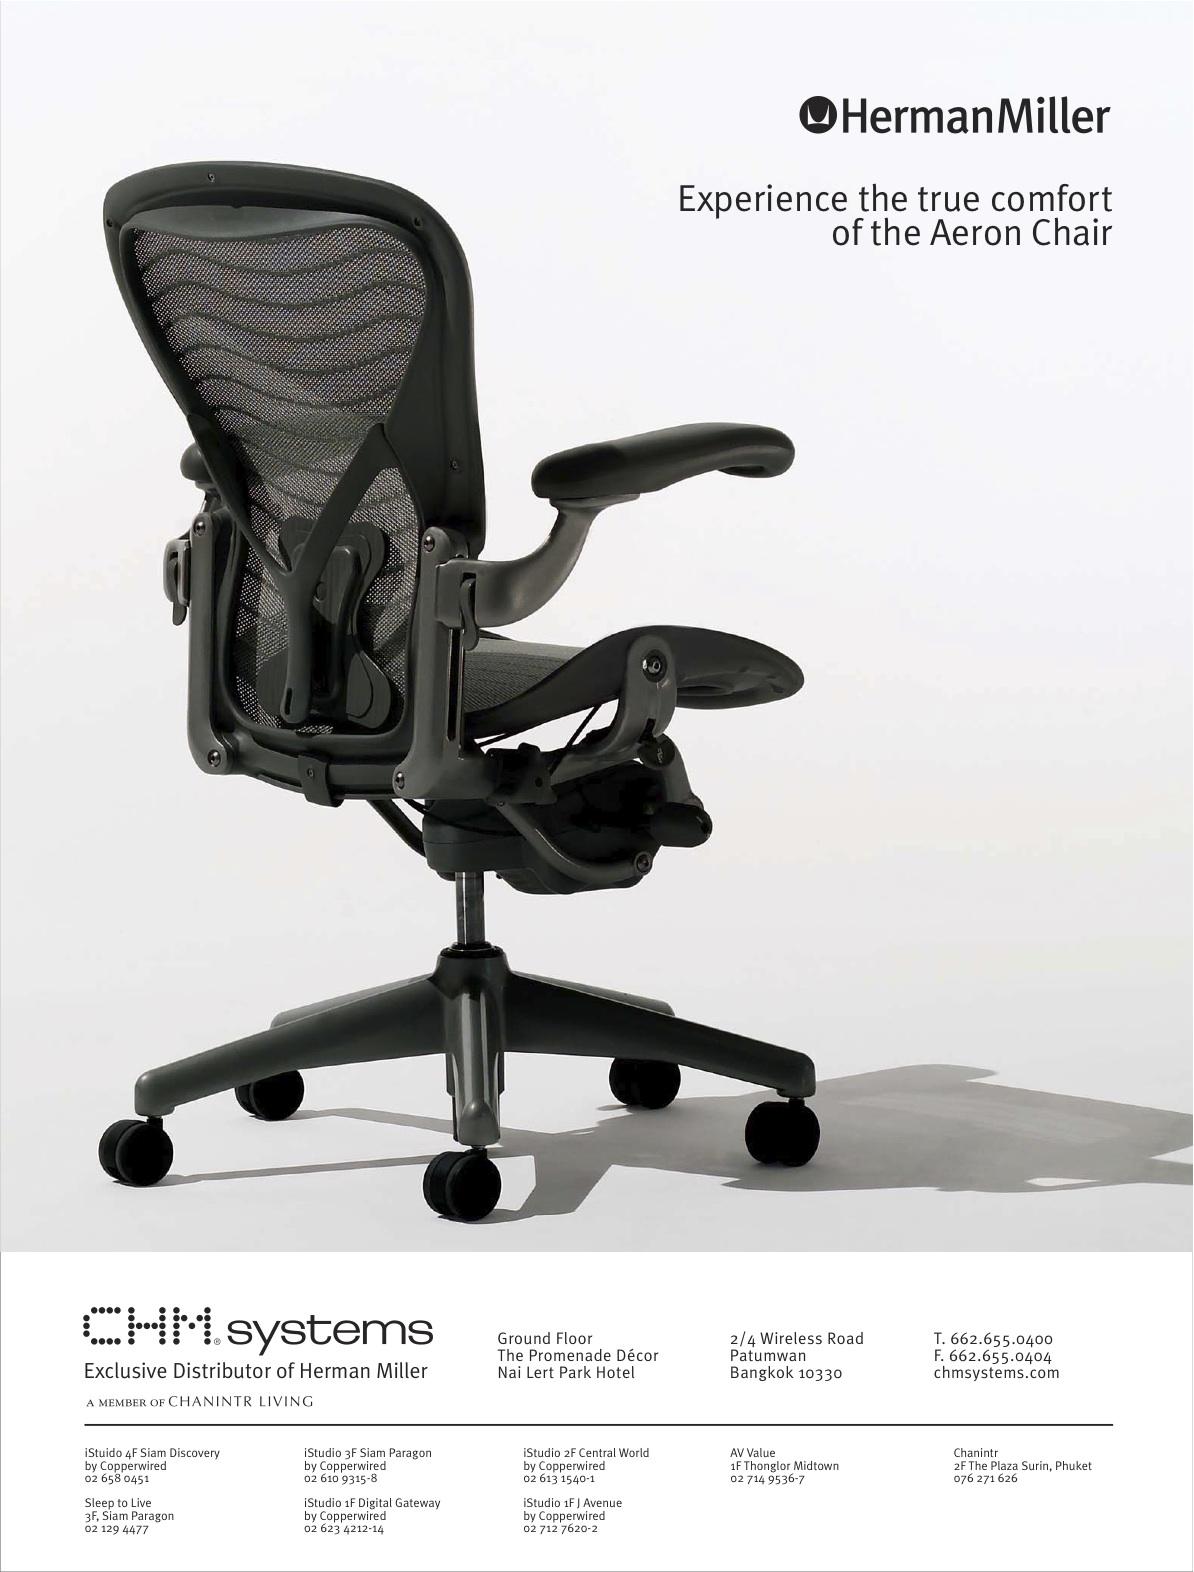 CHMsystems, Herman Miller, Aeron Chair